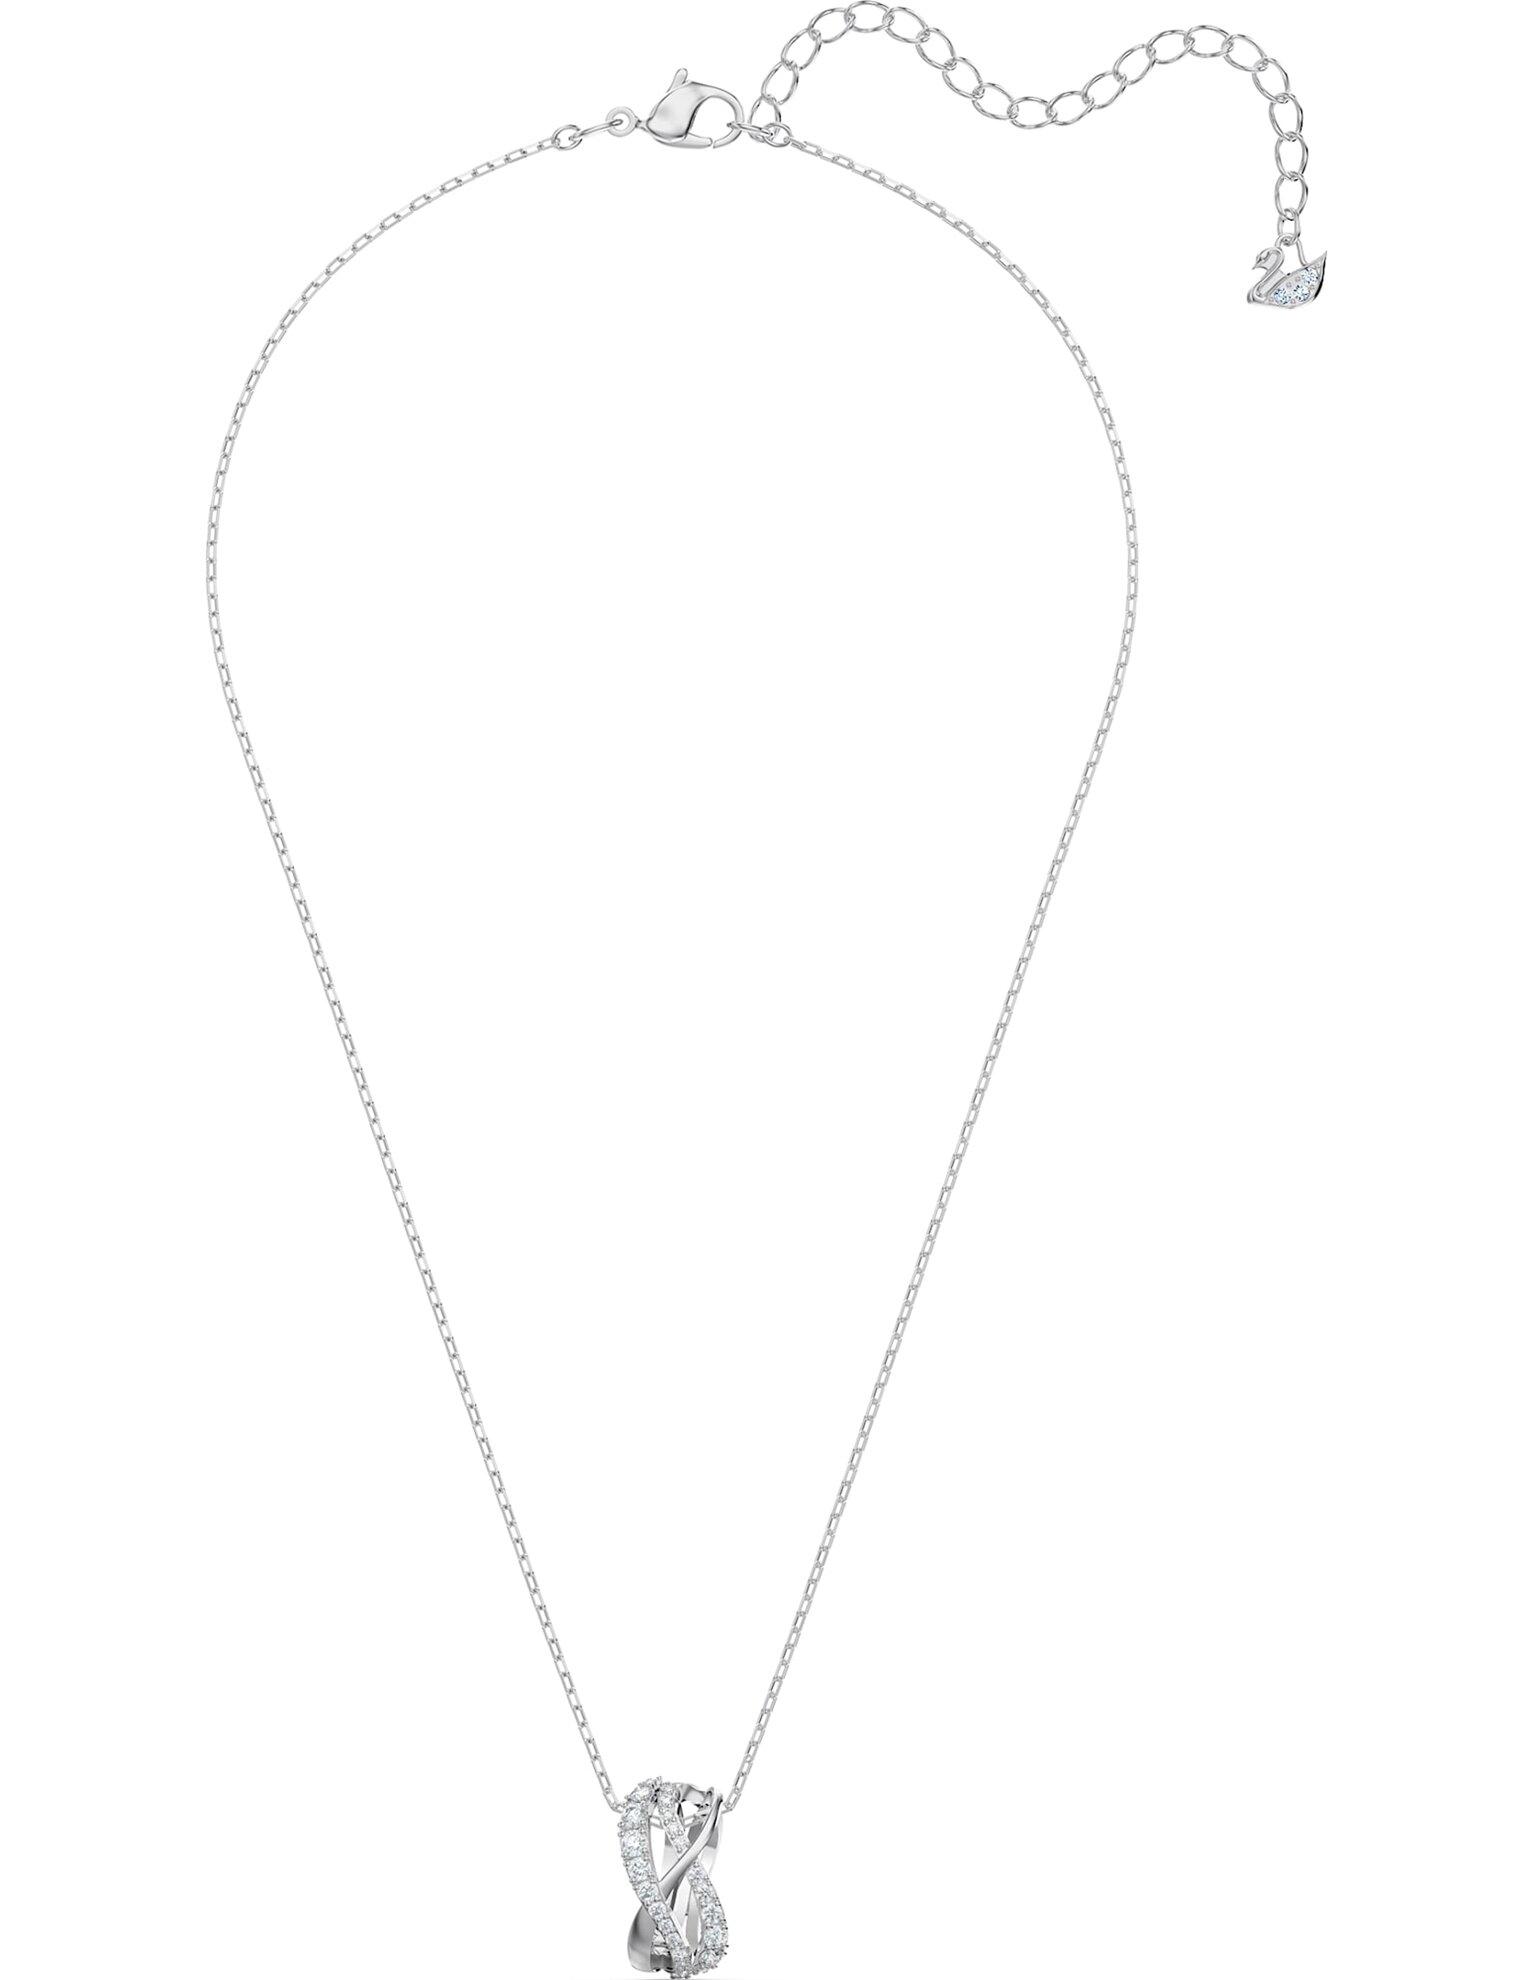 Picture of Twist Rows kolye, Beyaz, Rodyum kaplama